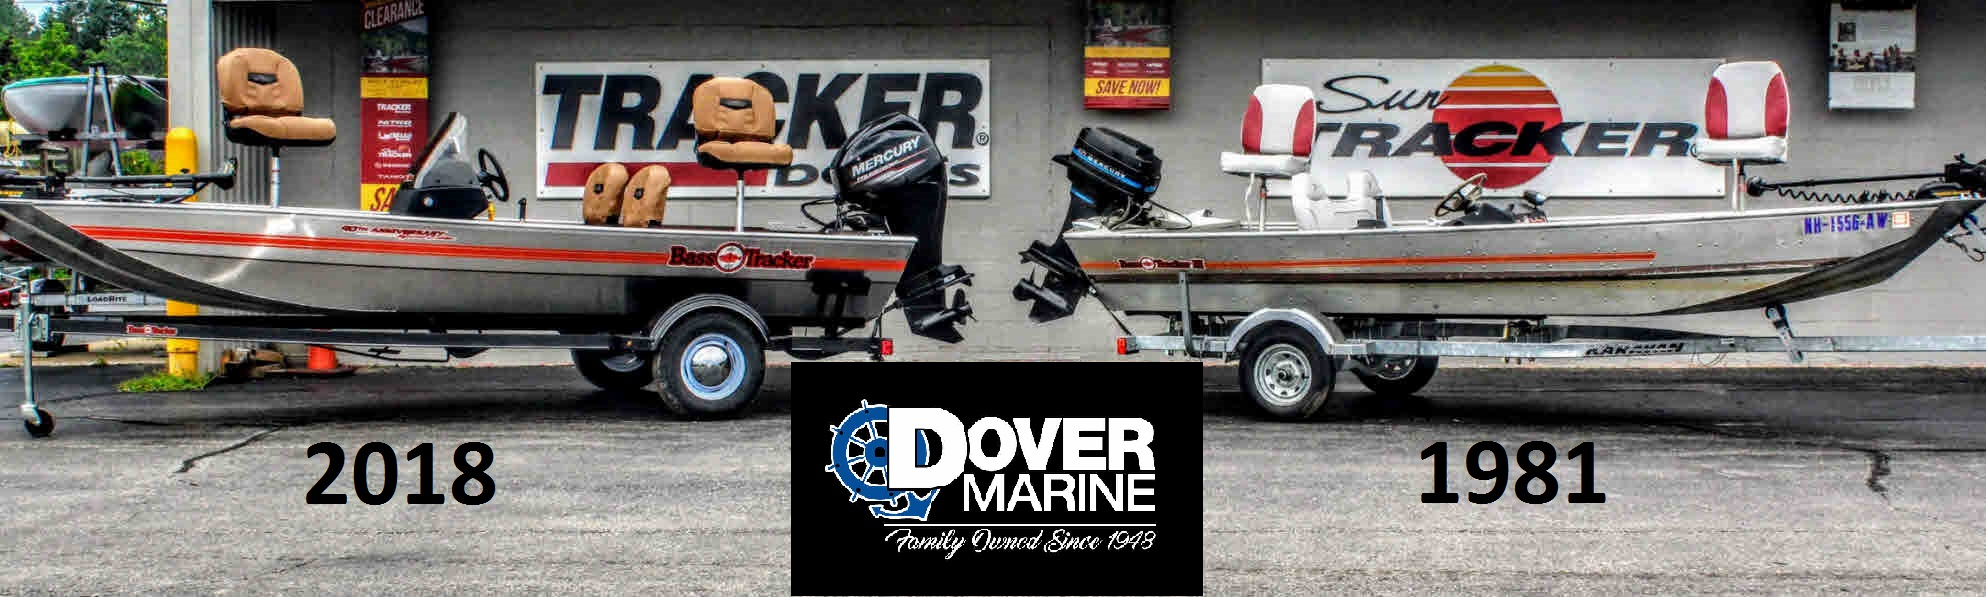 Tracker Nitro Boat Parts Bass 175 Txw Wiring Diagram Home Dover Marine 1986x597